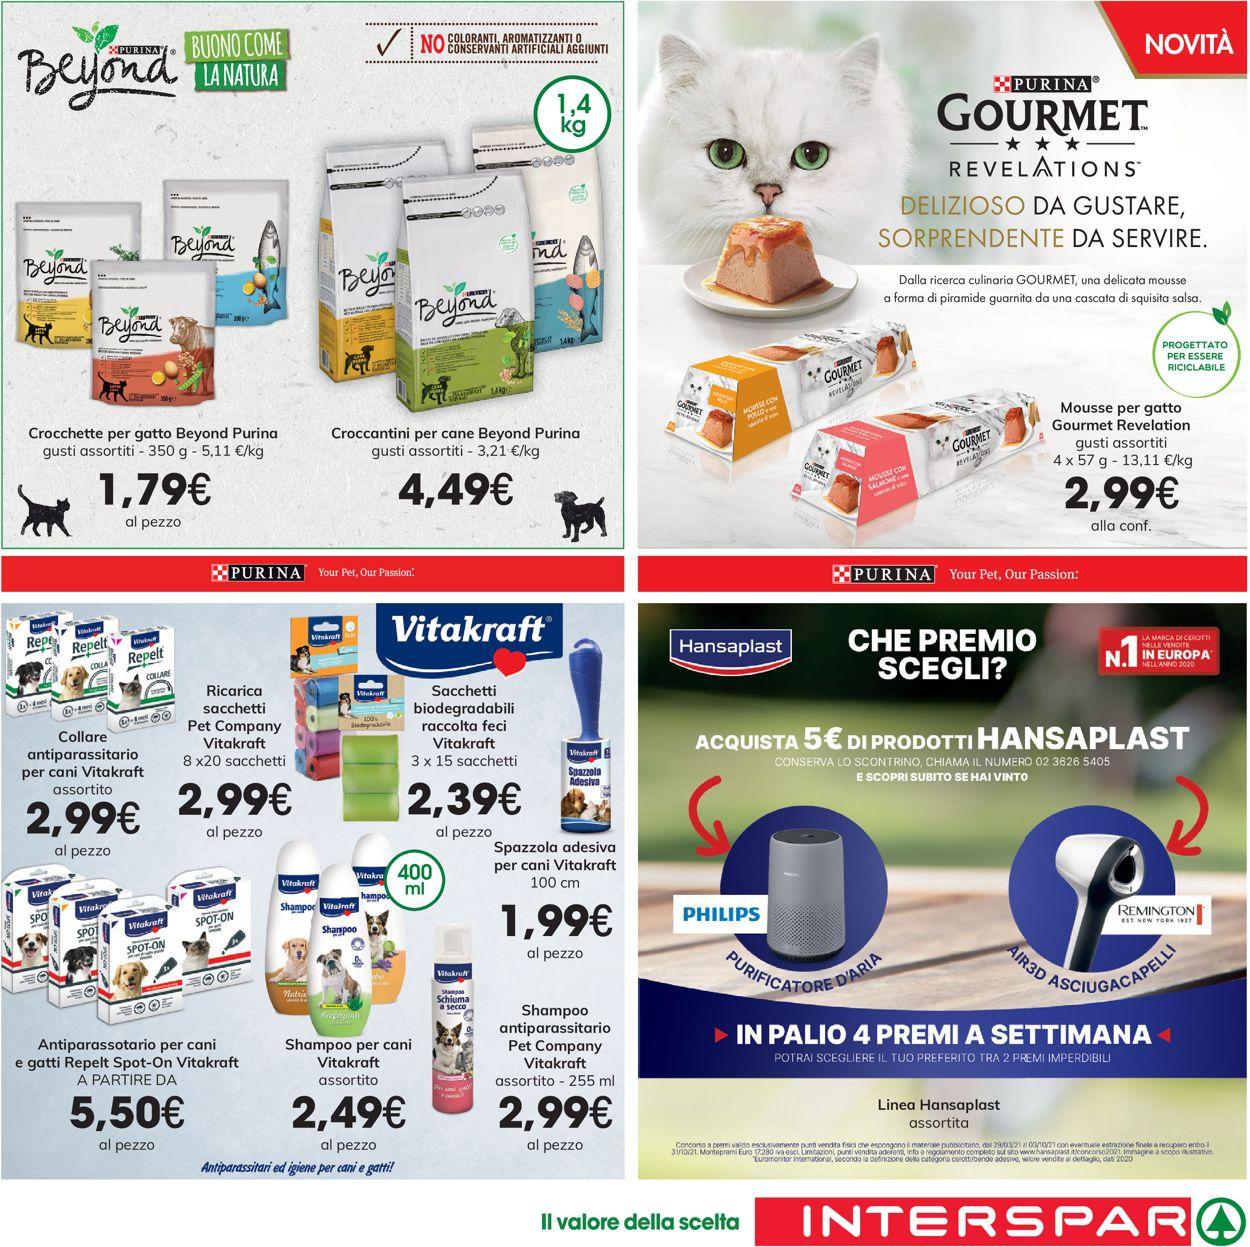 Volantino Interspar - Offerte 10/06-23/06/2021 (Pagina 13)